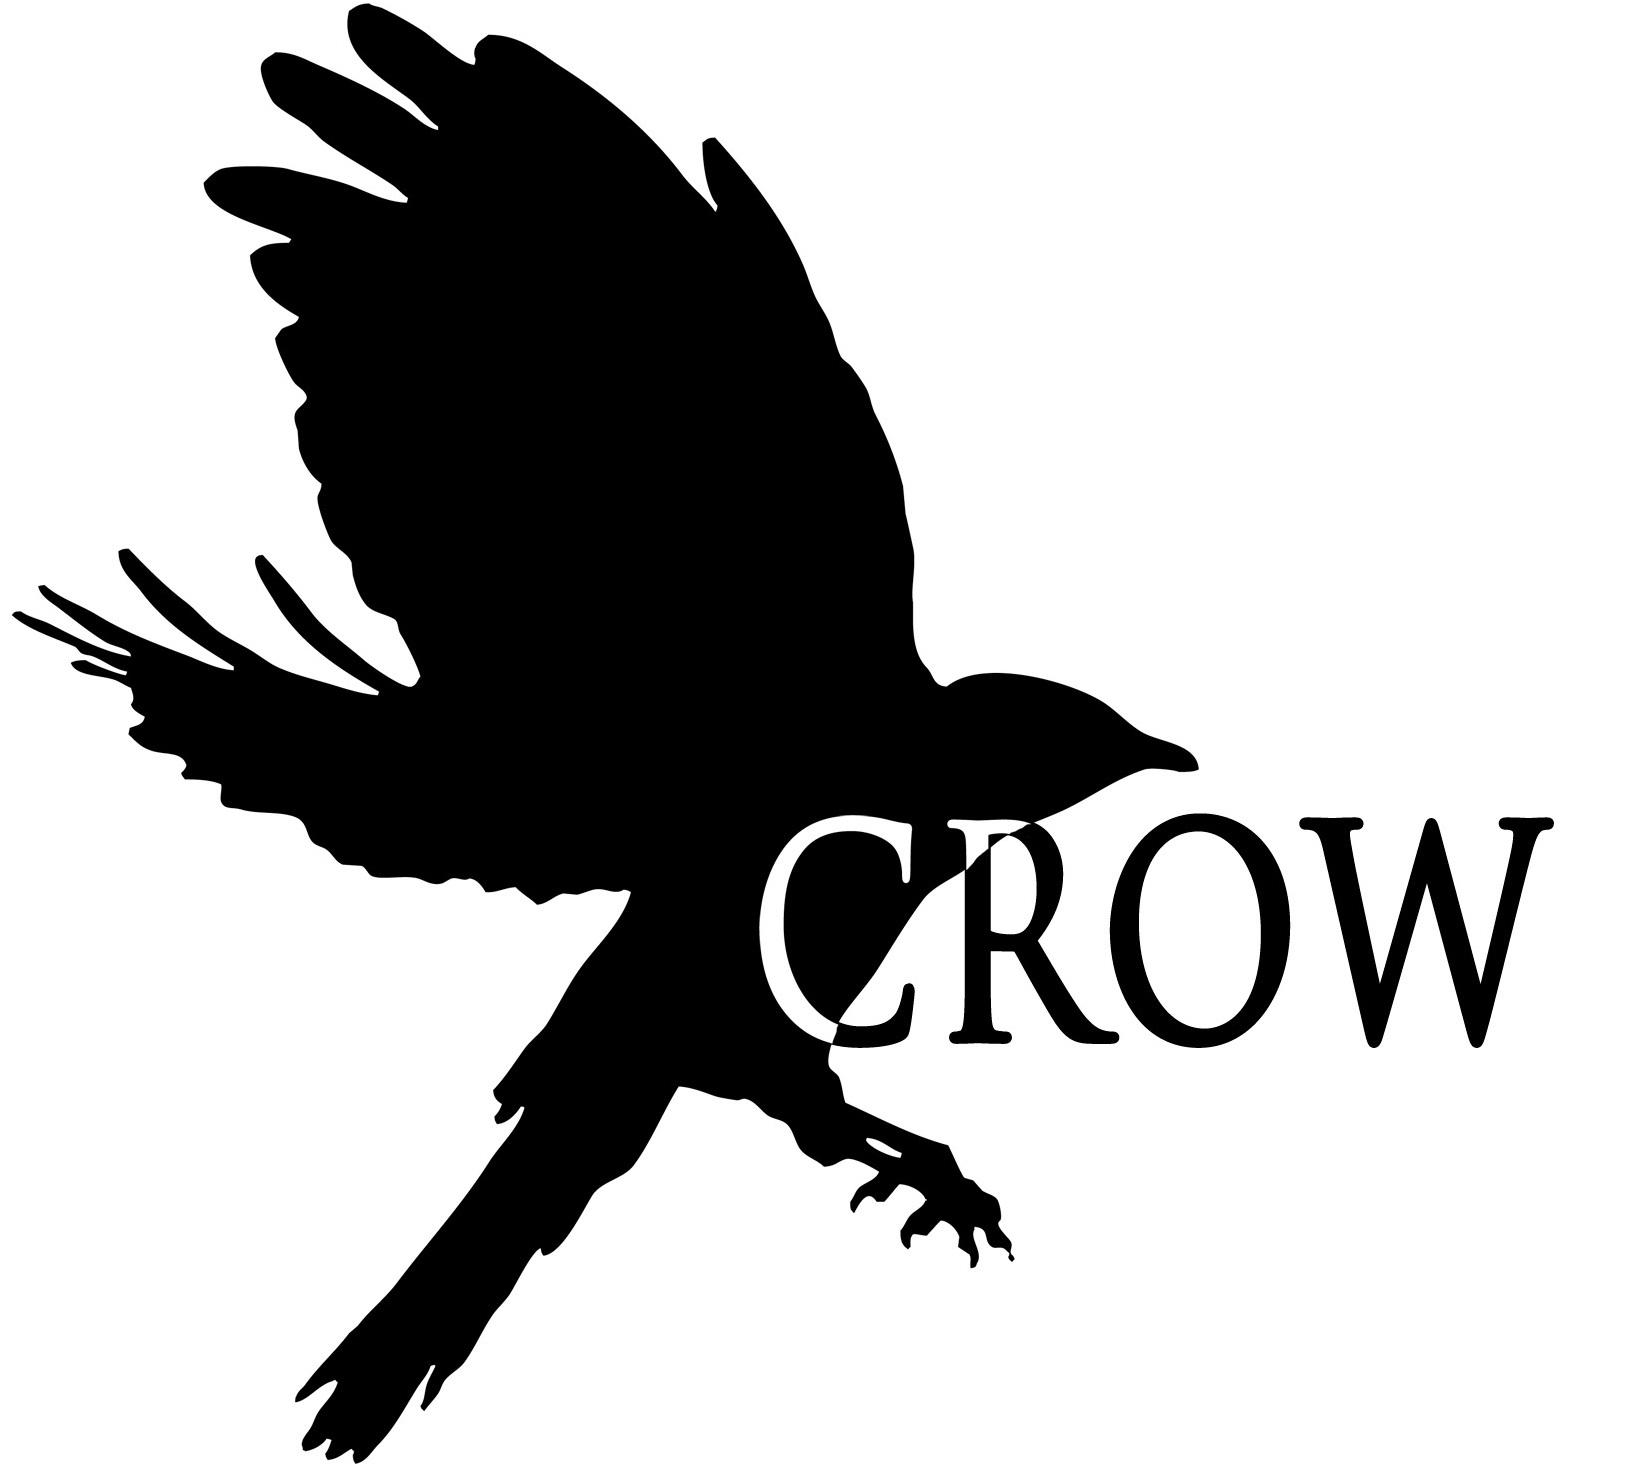 Contact crow logo sciox Choice Image